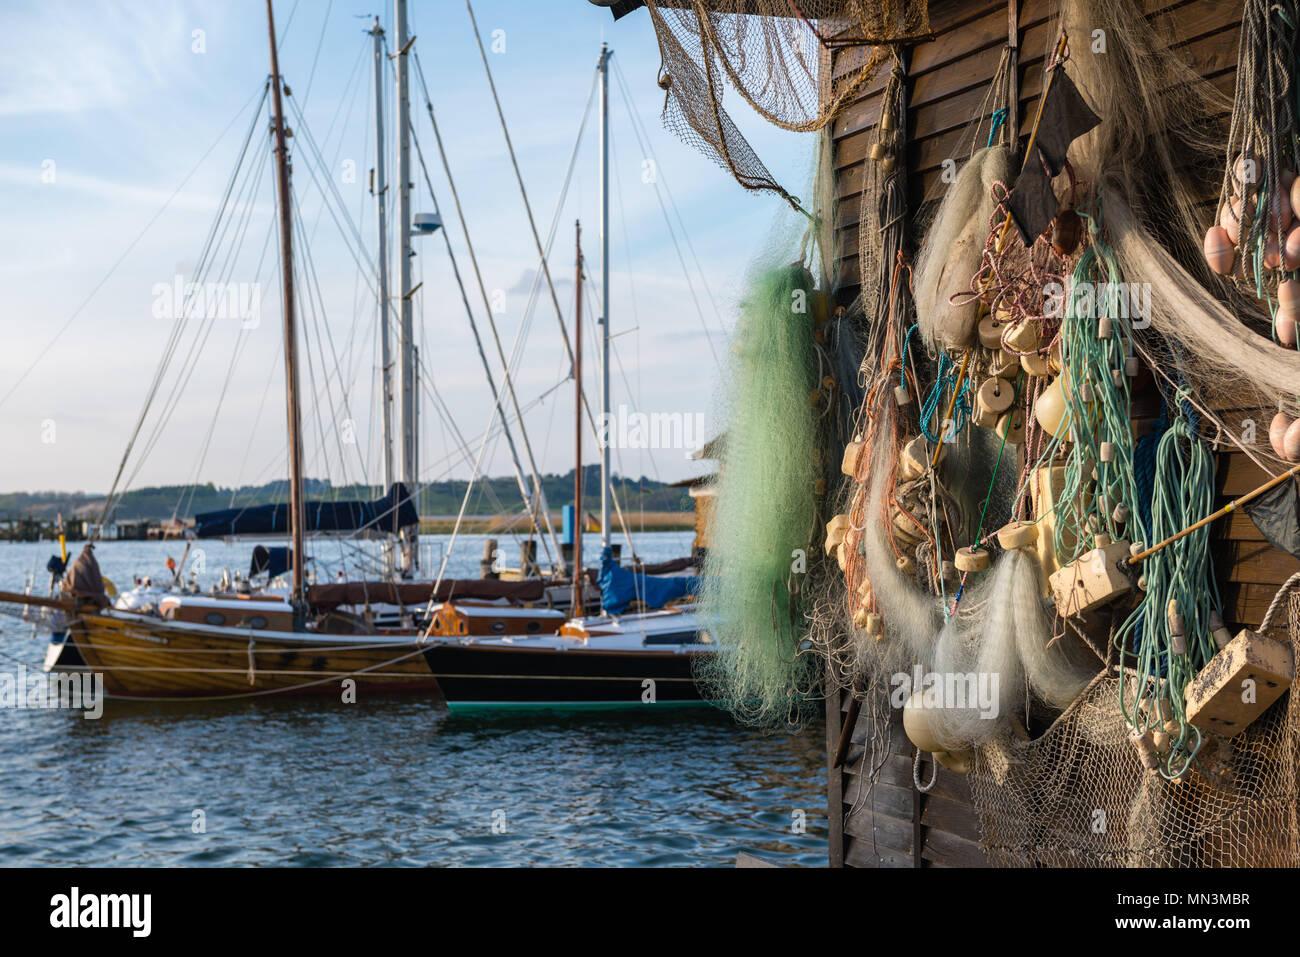 Habour scene of Gager, island of Rügen, Baltic Sea, Mecklenburg-West Pomerania, Germany - Stock Image